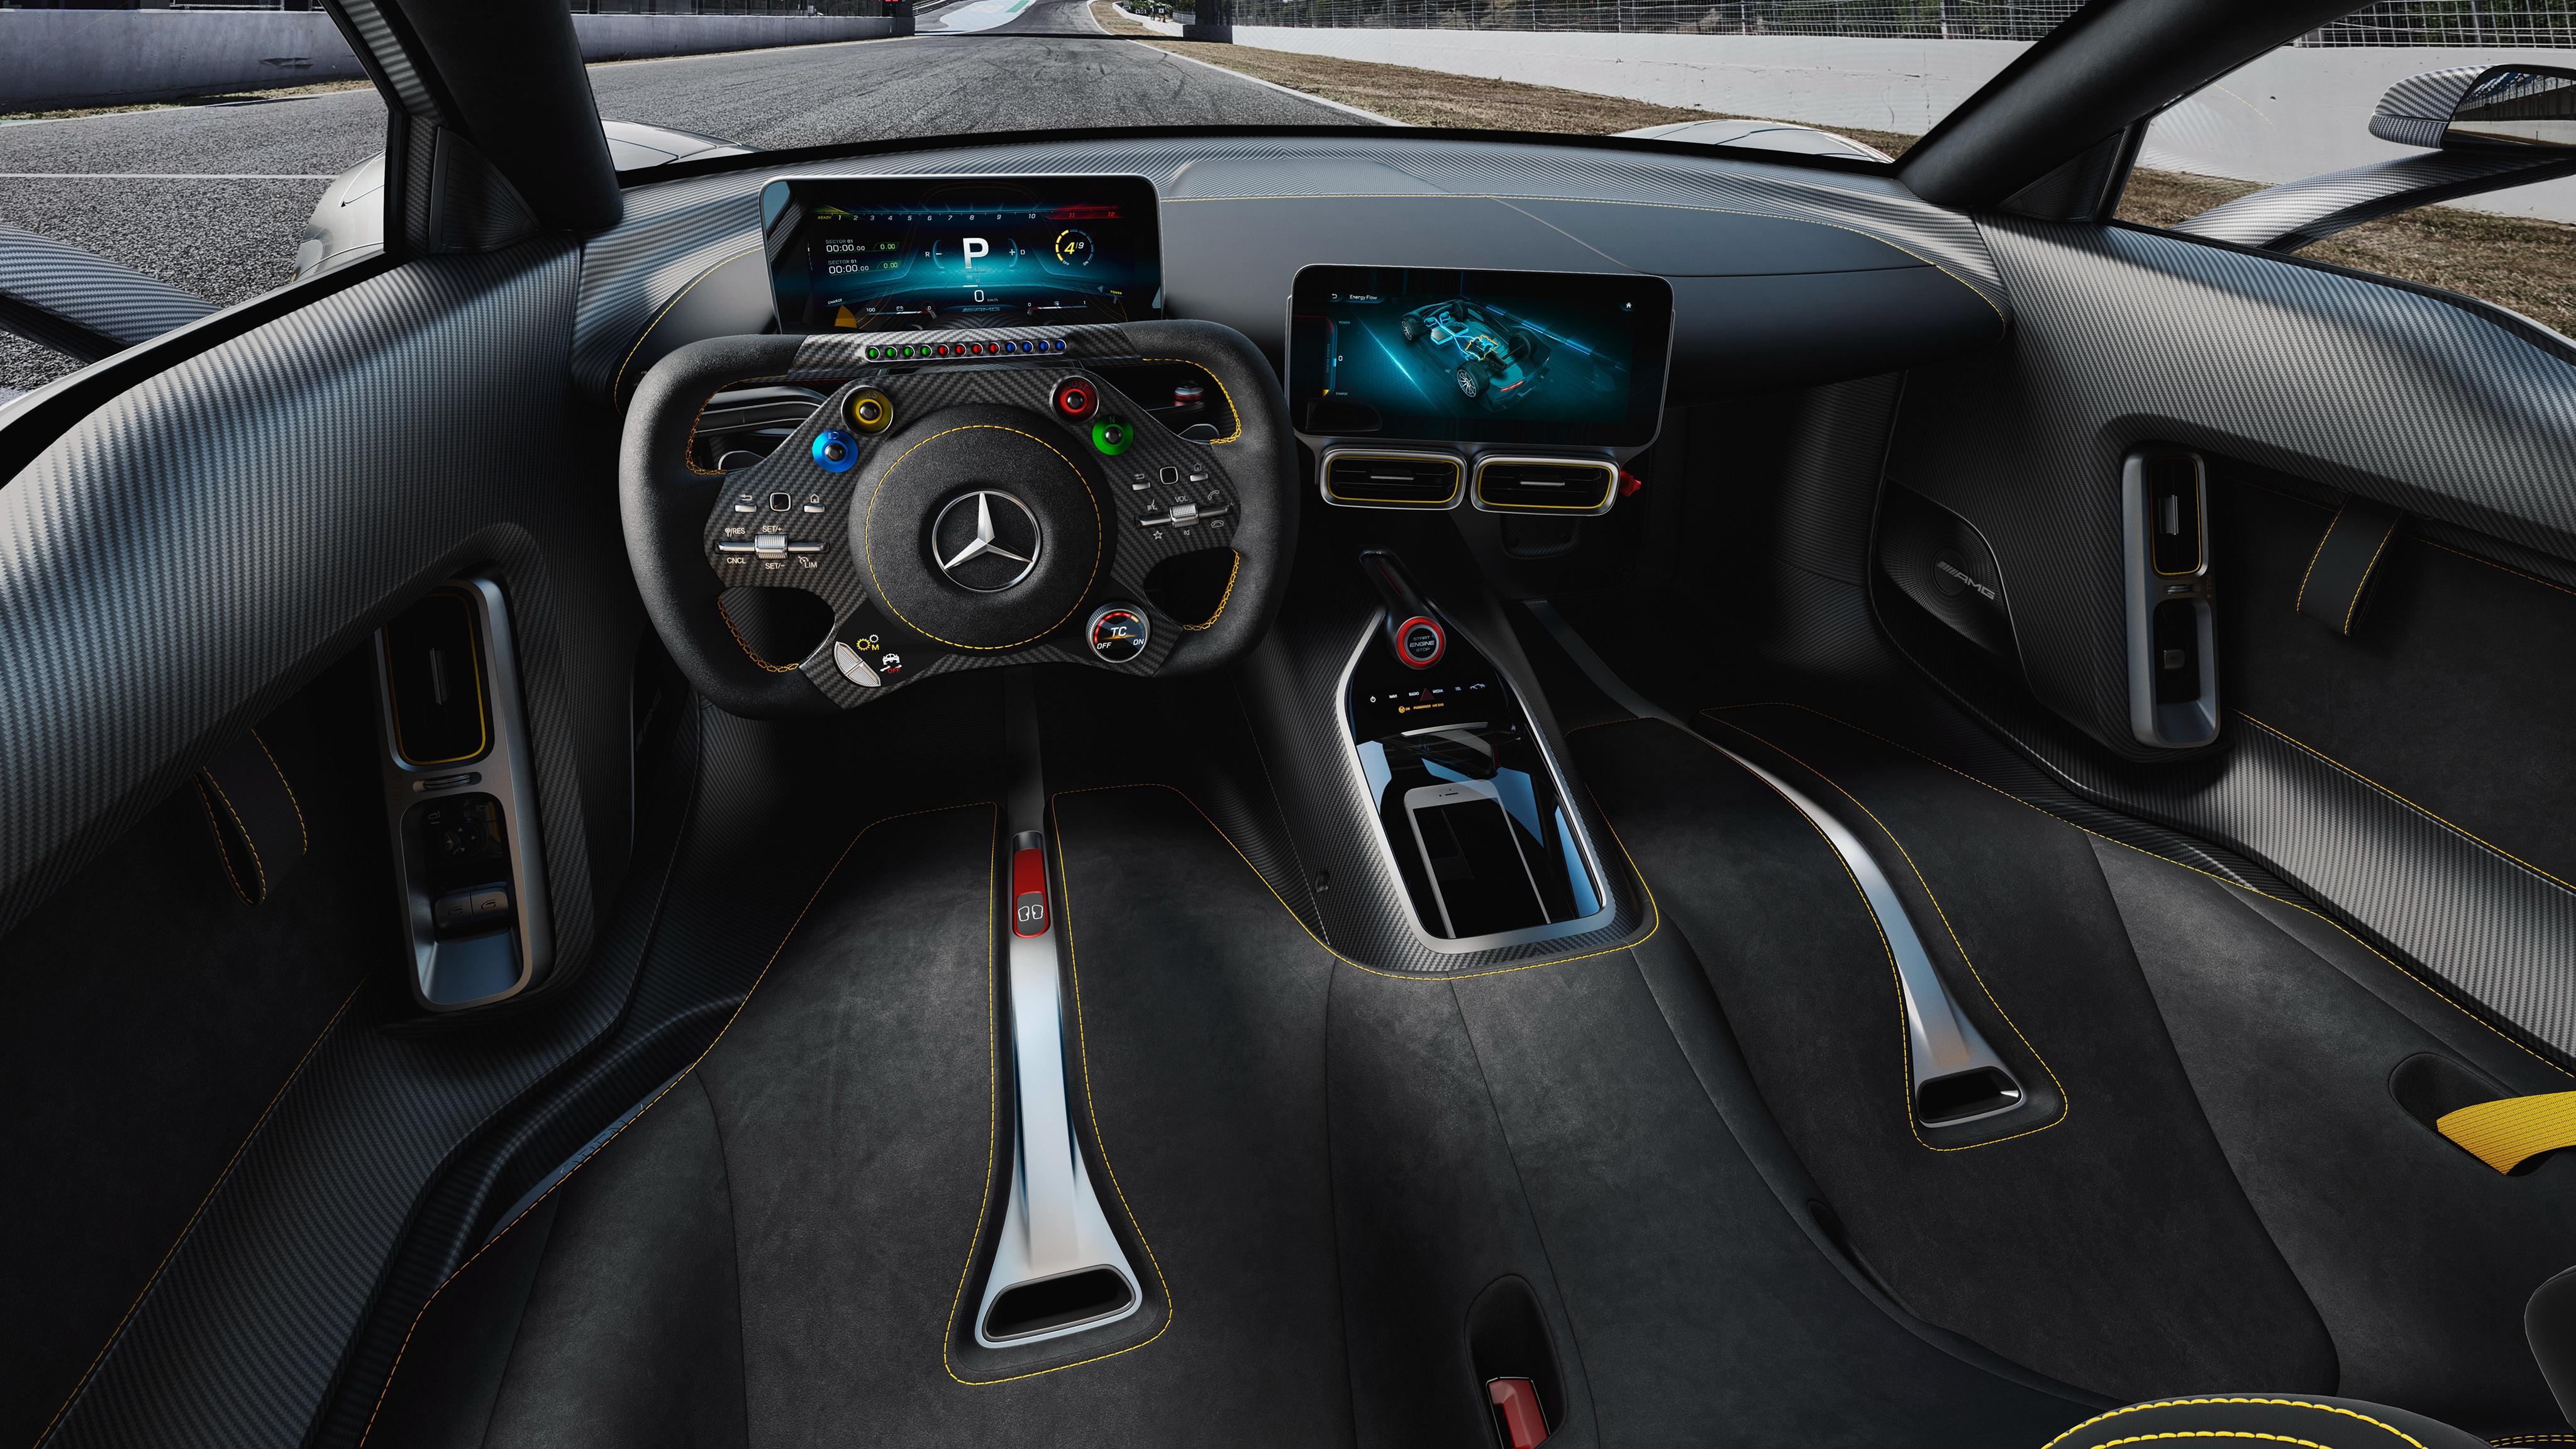 2018 Mercedes Amg Project One 4k Interior Wallpaper Hd Car